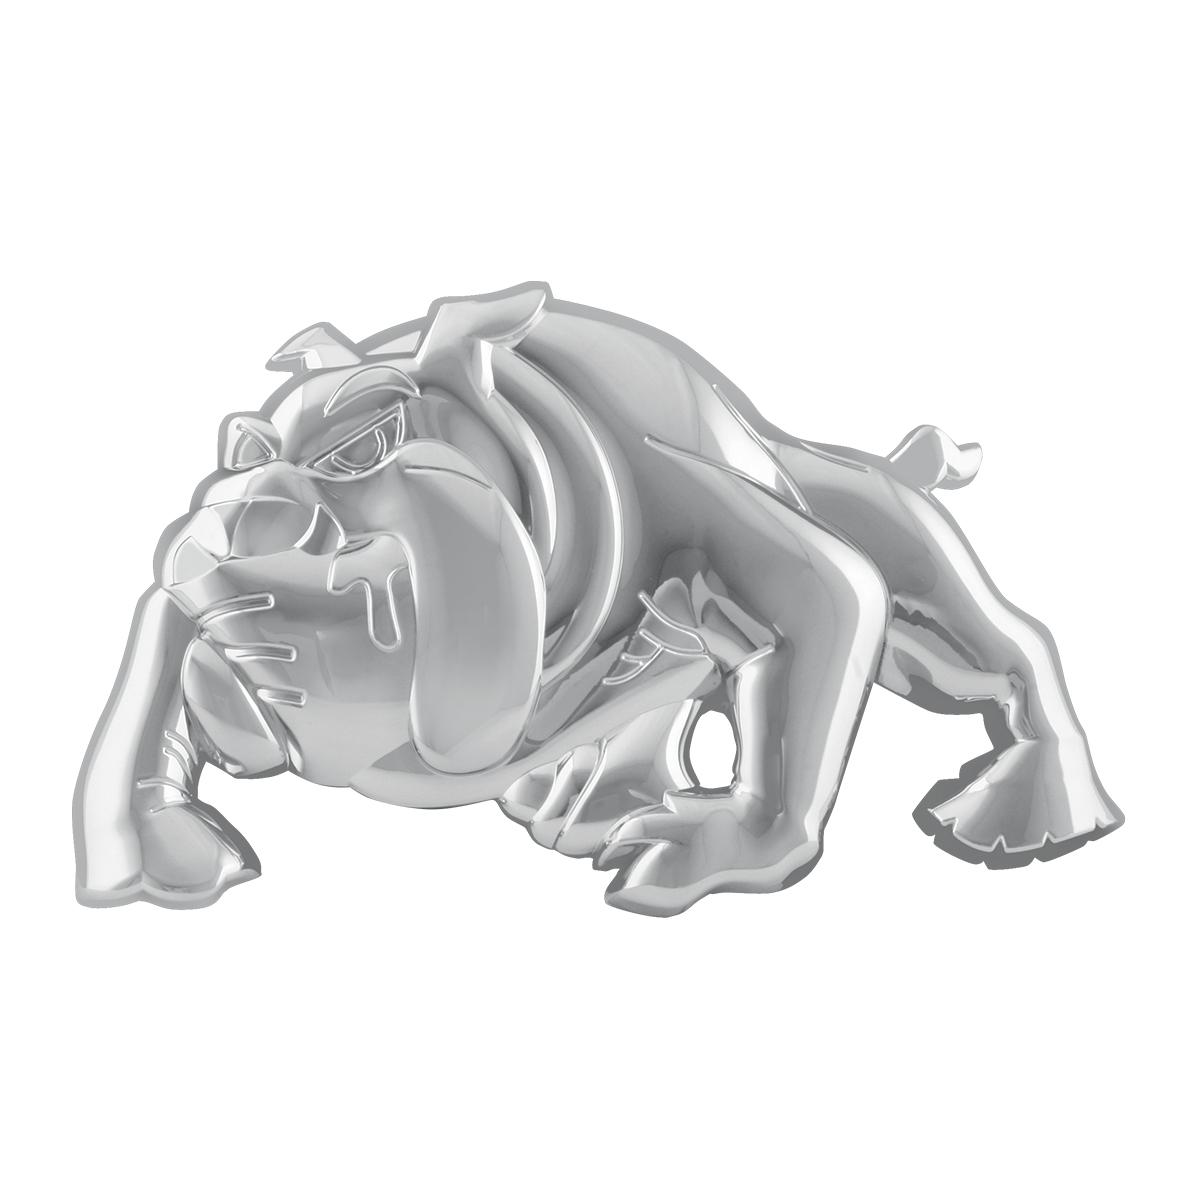 #94262 Chrome Plastic Bulldog Accent w/Tape - Facing Left